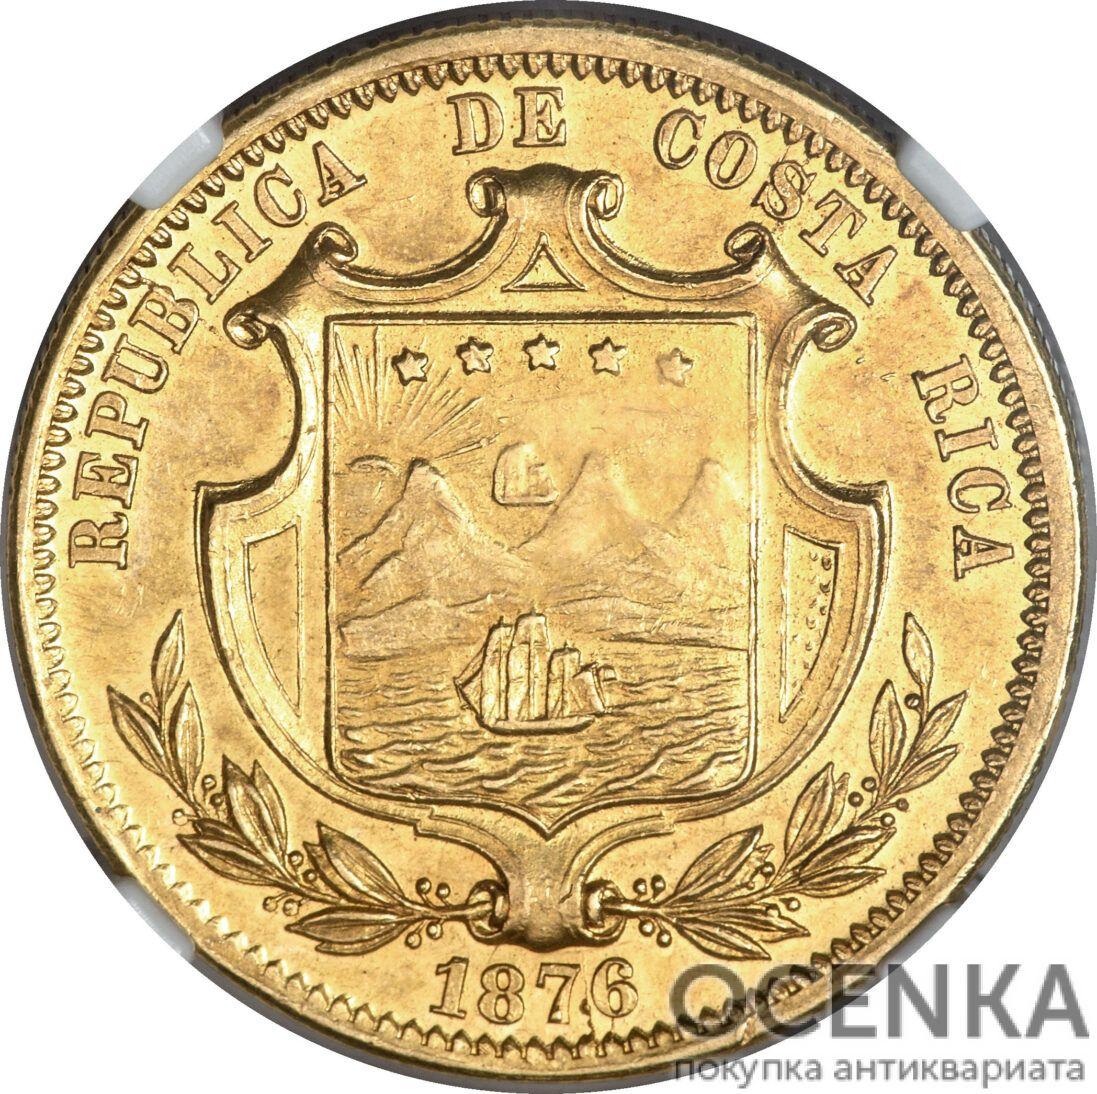 Золотая монета 10 Песо (10 Pesos) Коста Рика - 3